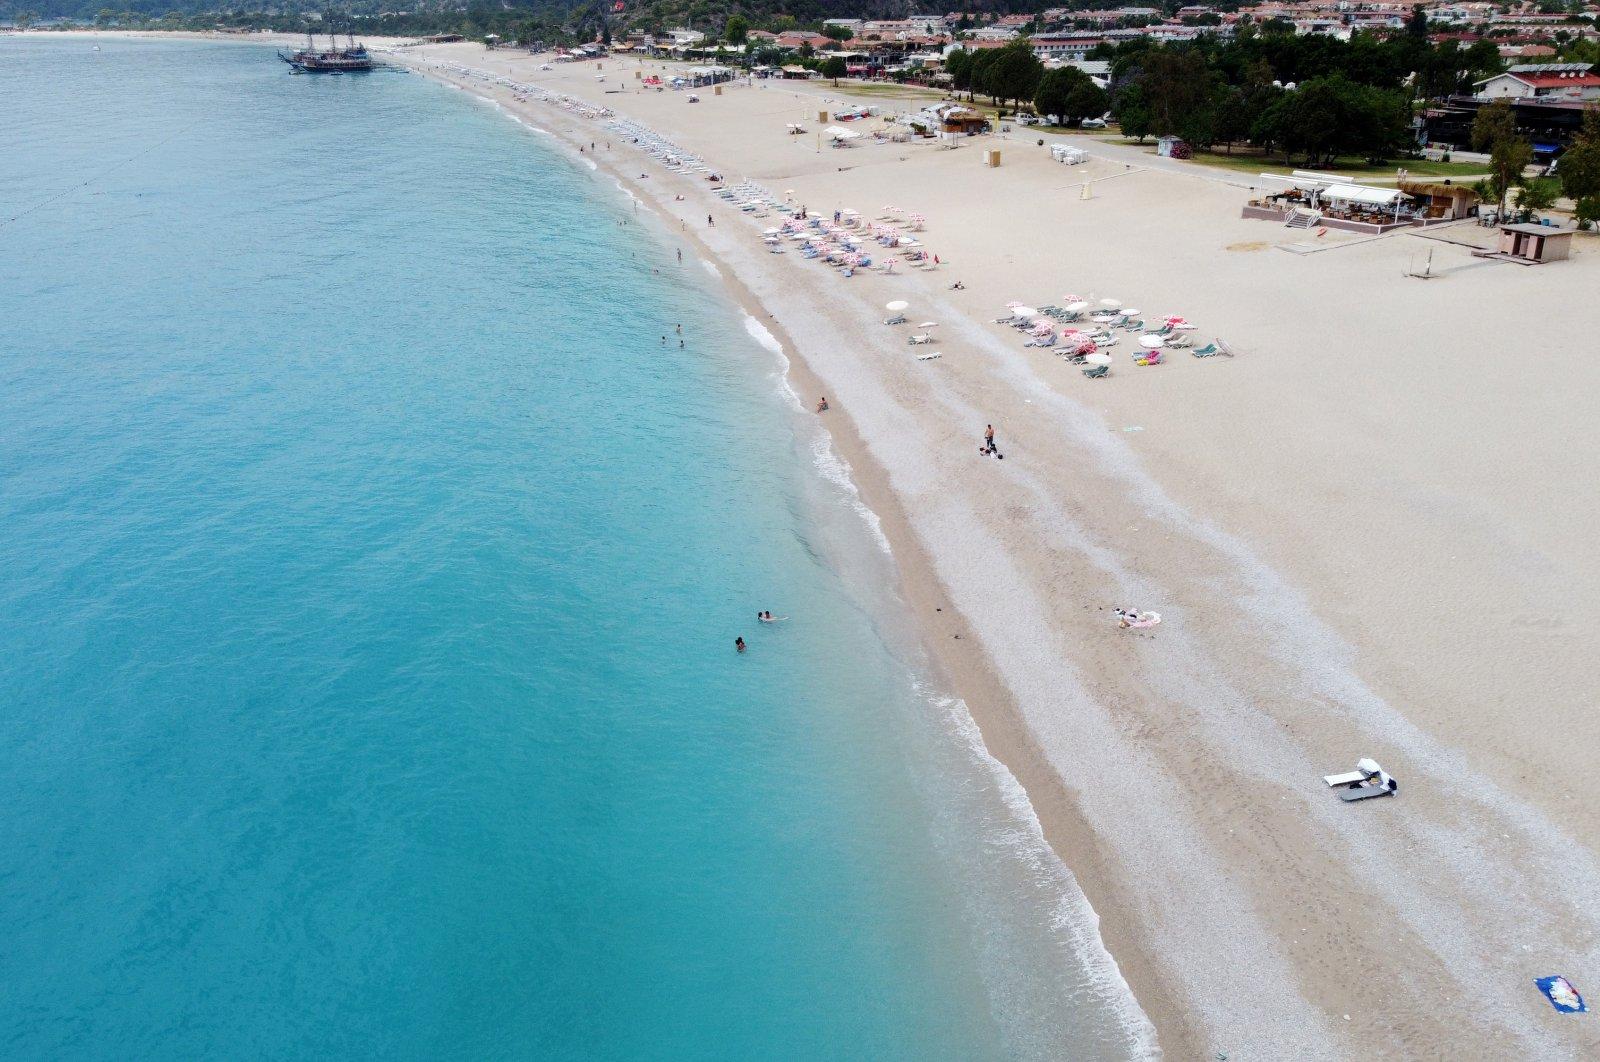 A view of a beach in Fethiye, Muğla province, southwestern Turkey, May 30, 2021. (AA Photo)